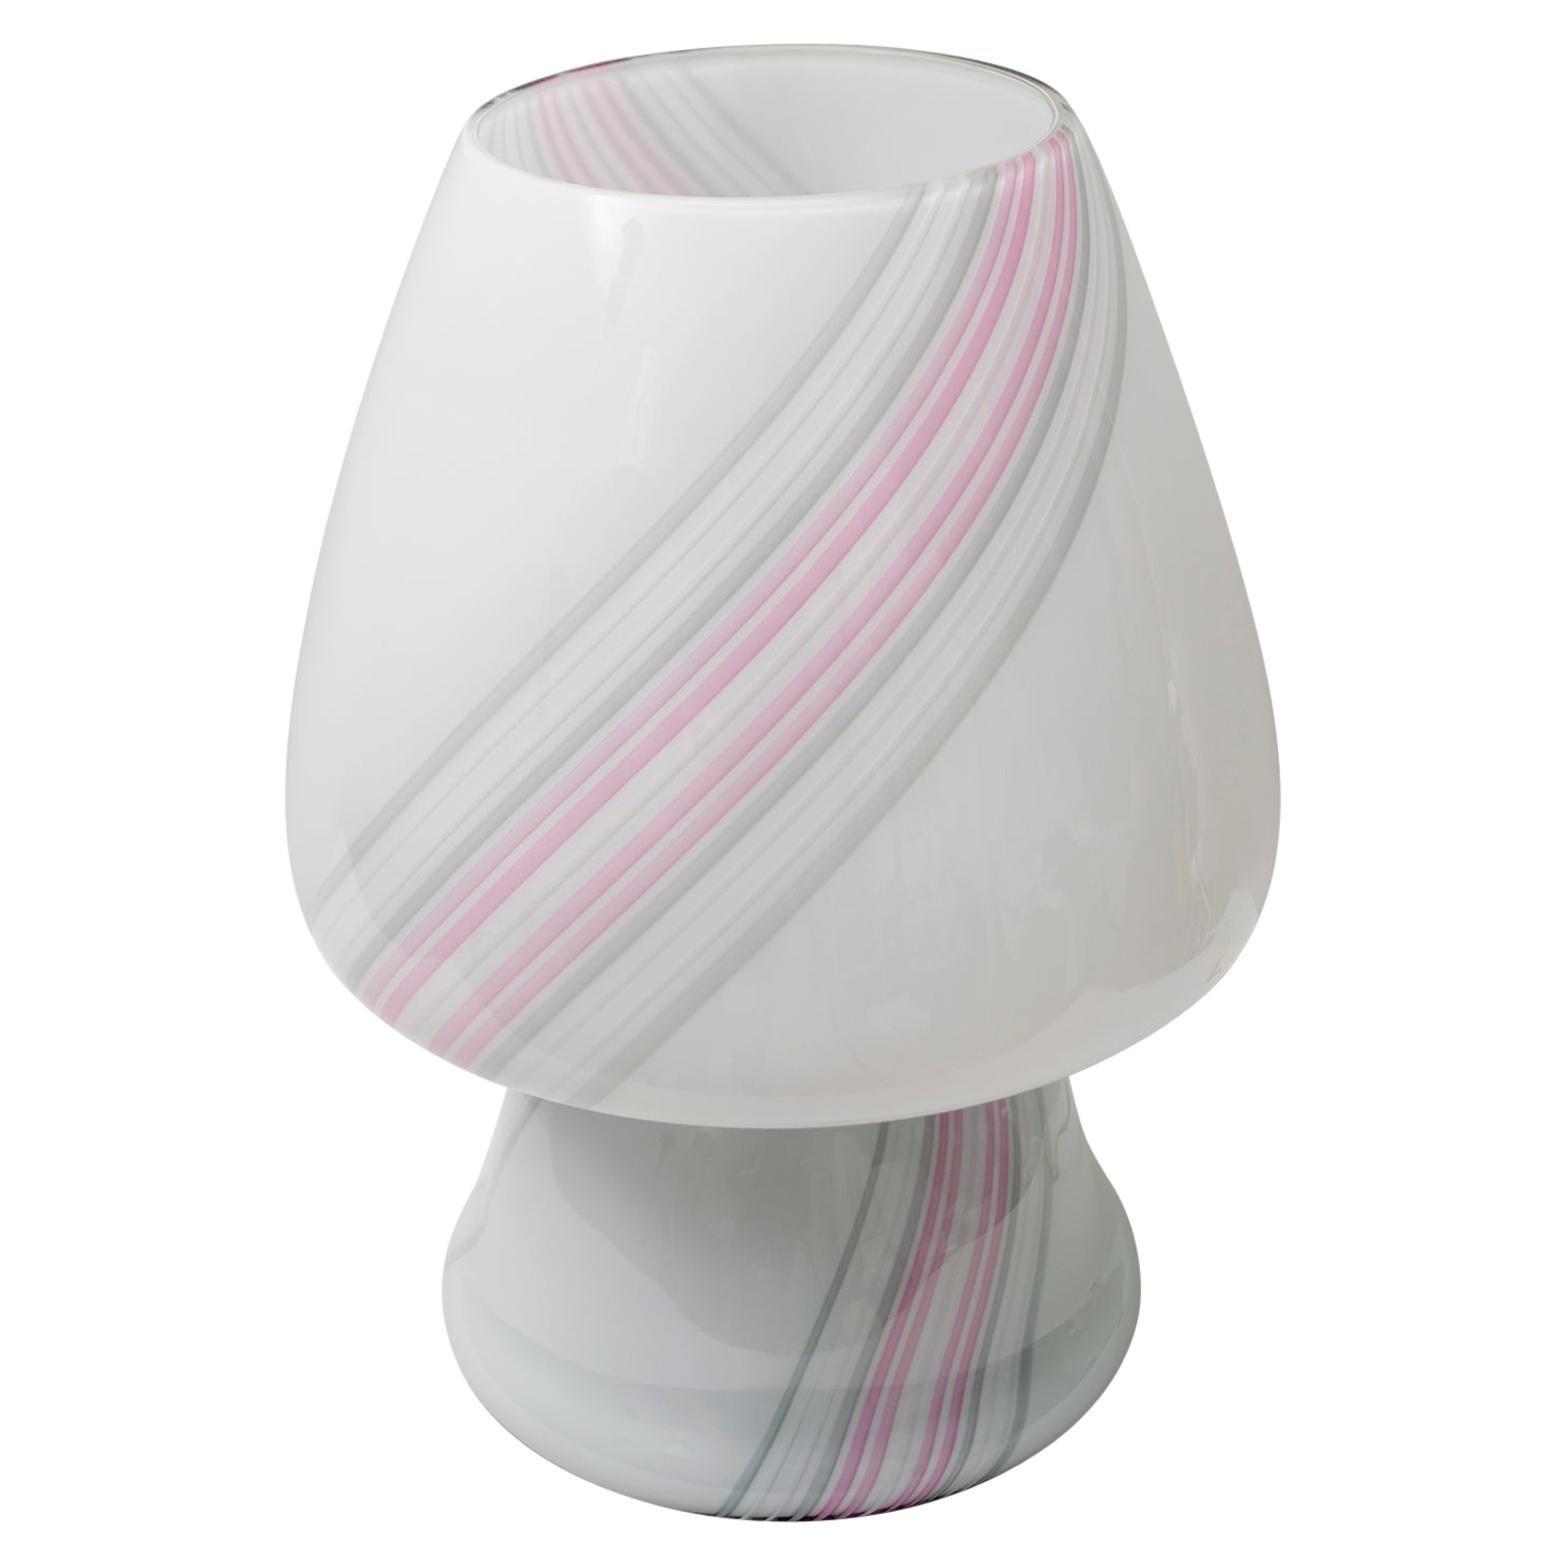 """Incamiciato"" Murano Glass Modern Mushroom Table Lamp, 1980s"